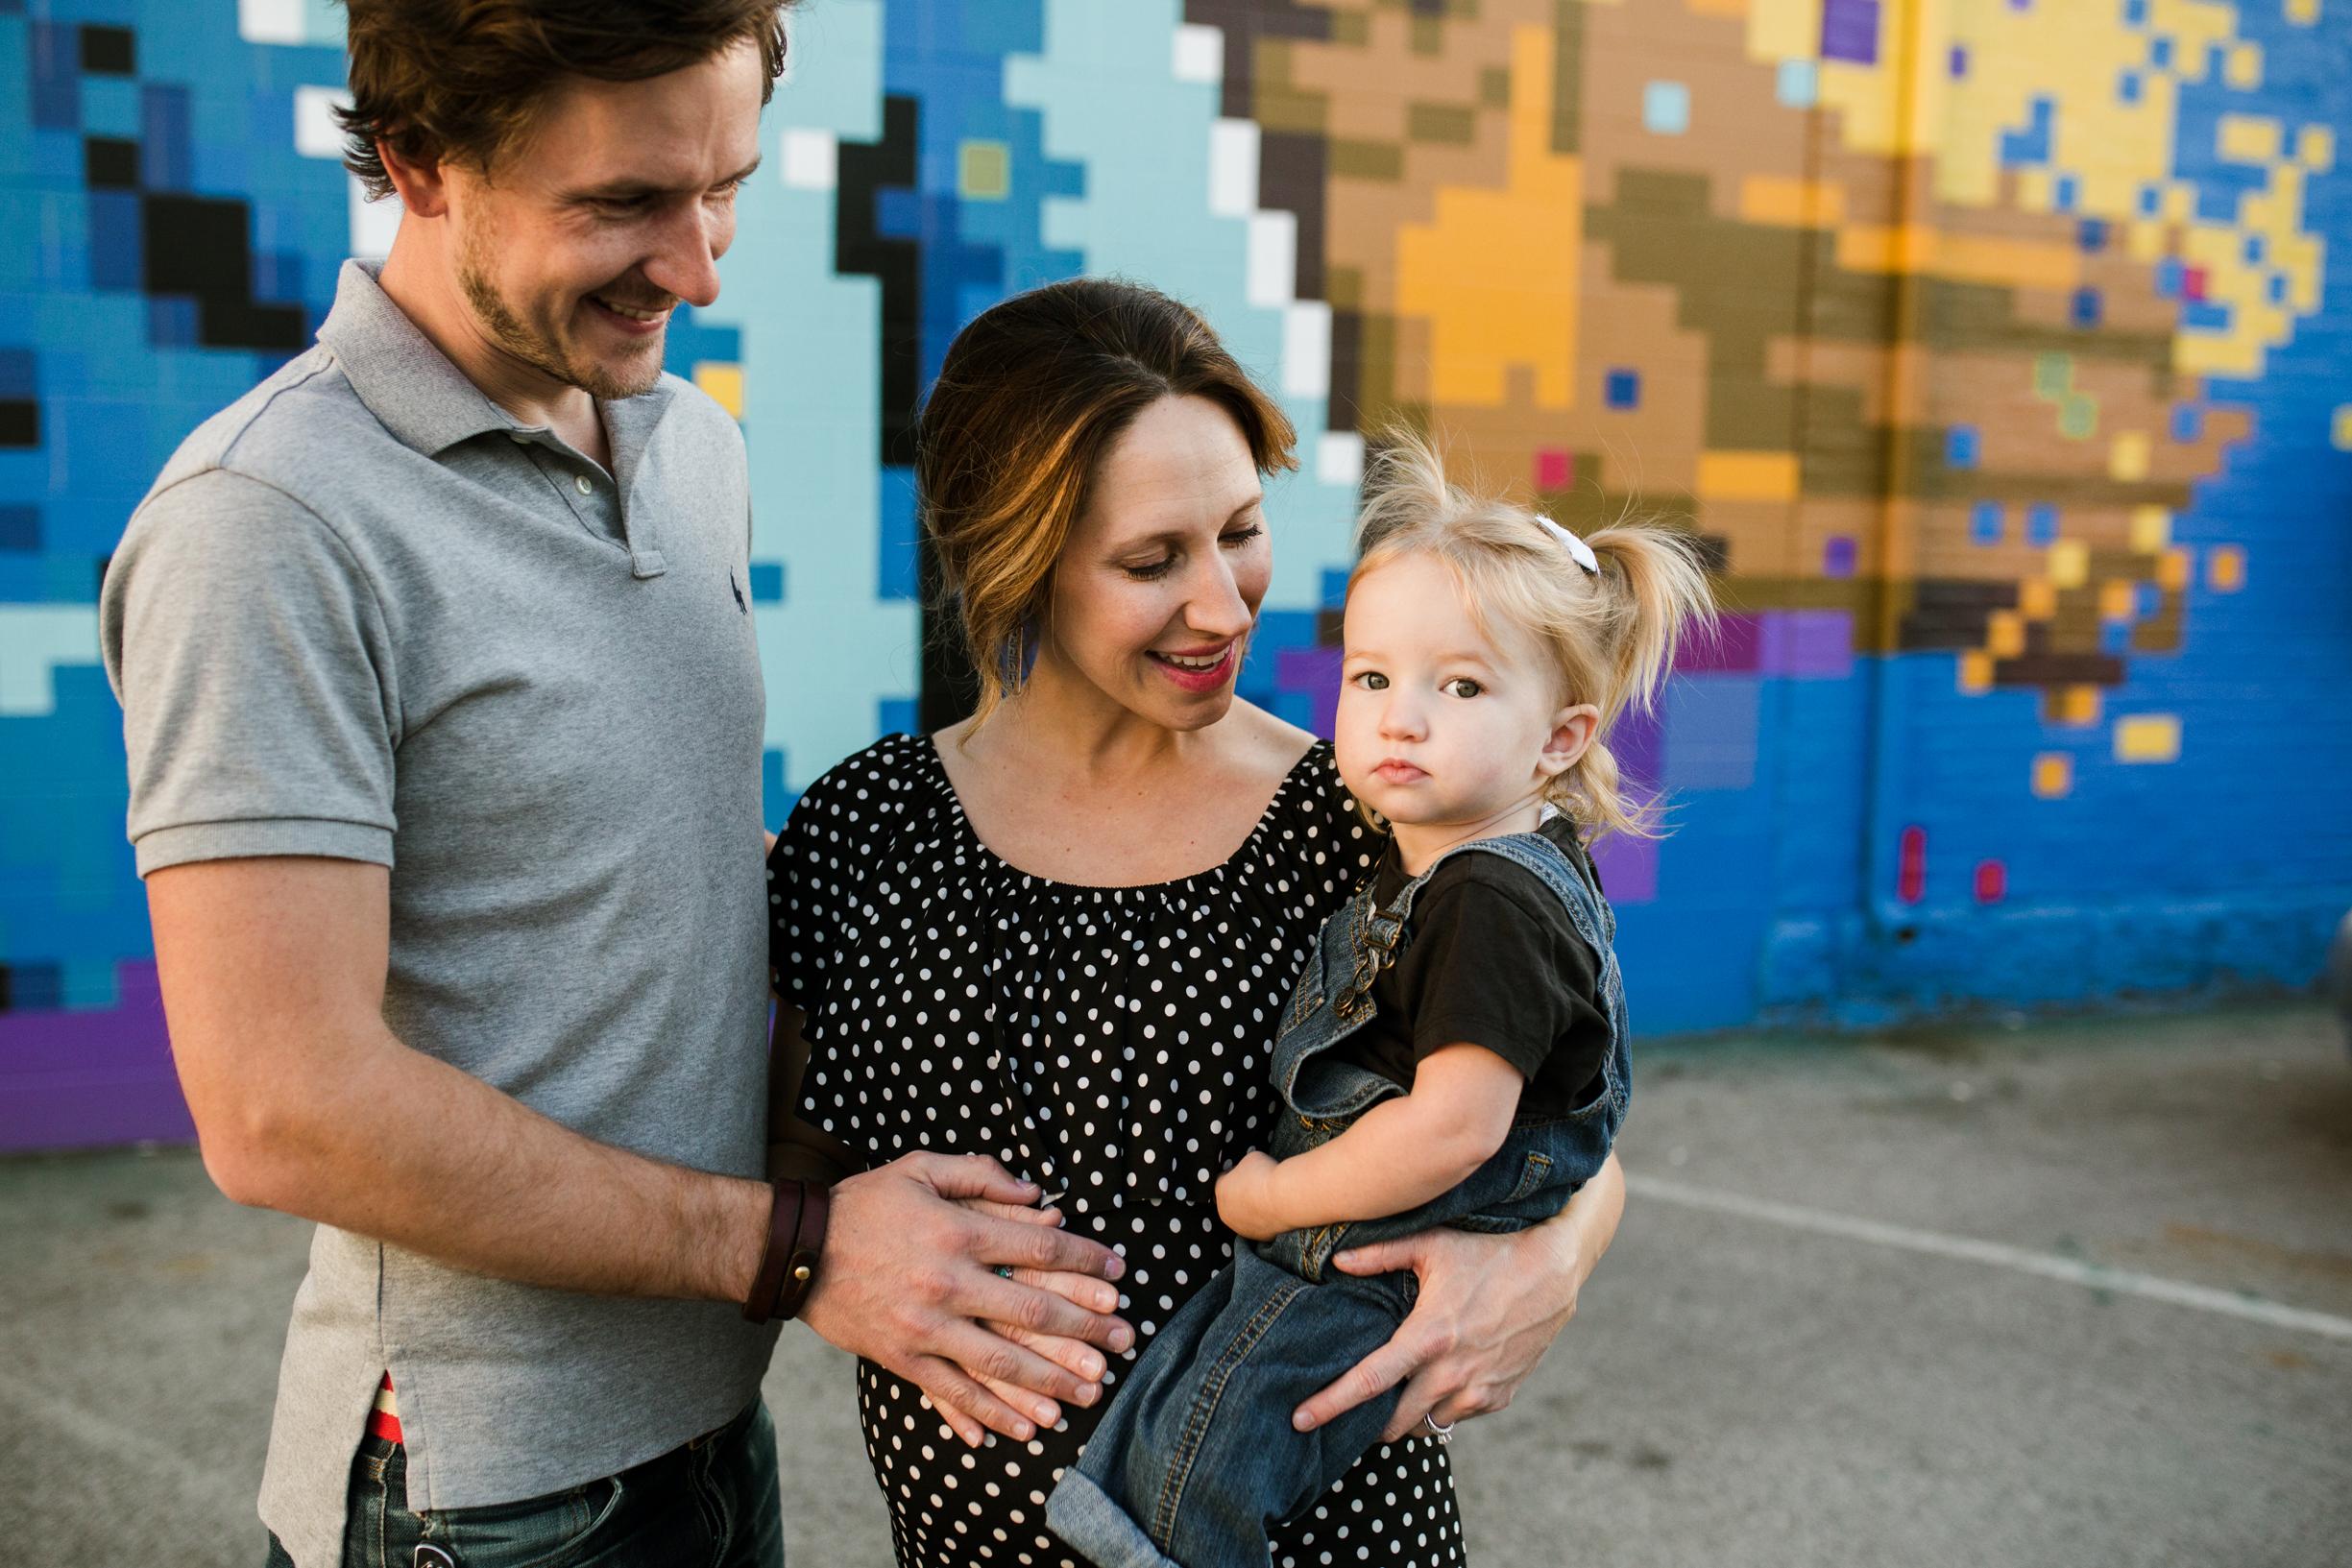 Disney Family 2017 (baby bump) WEBSITE Crystal Ludwick Photo (43 of 68).jpg